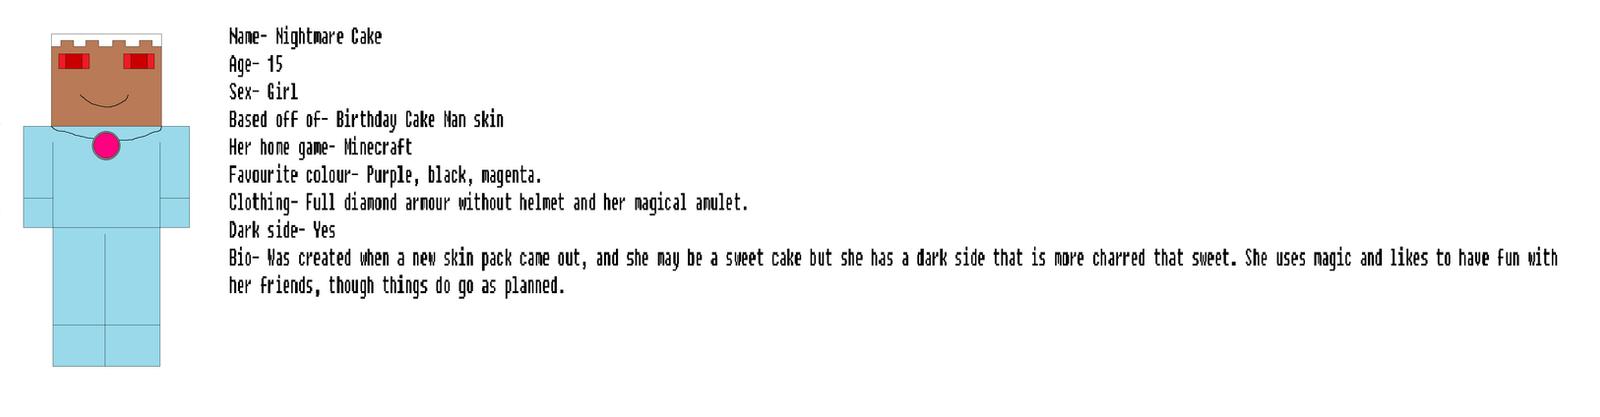 Nightmare Cake reference sheet by Nightmarecake4268